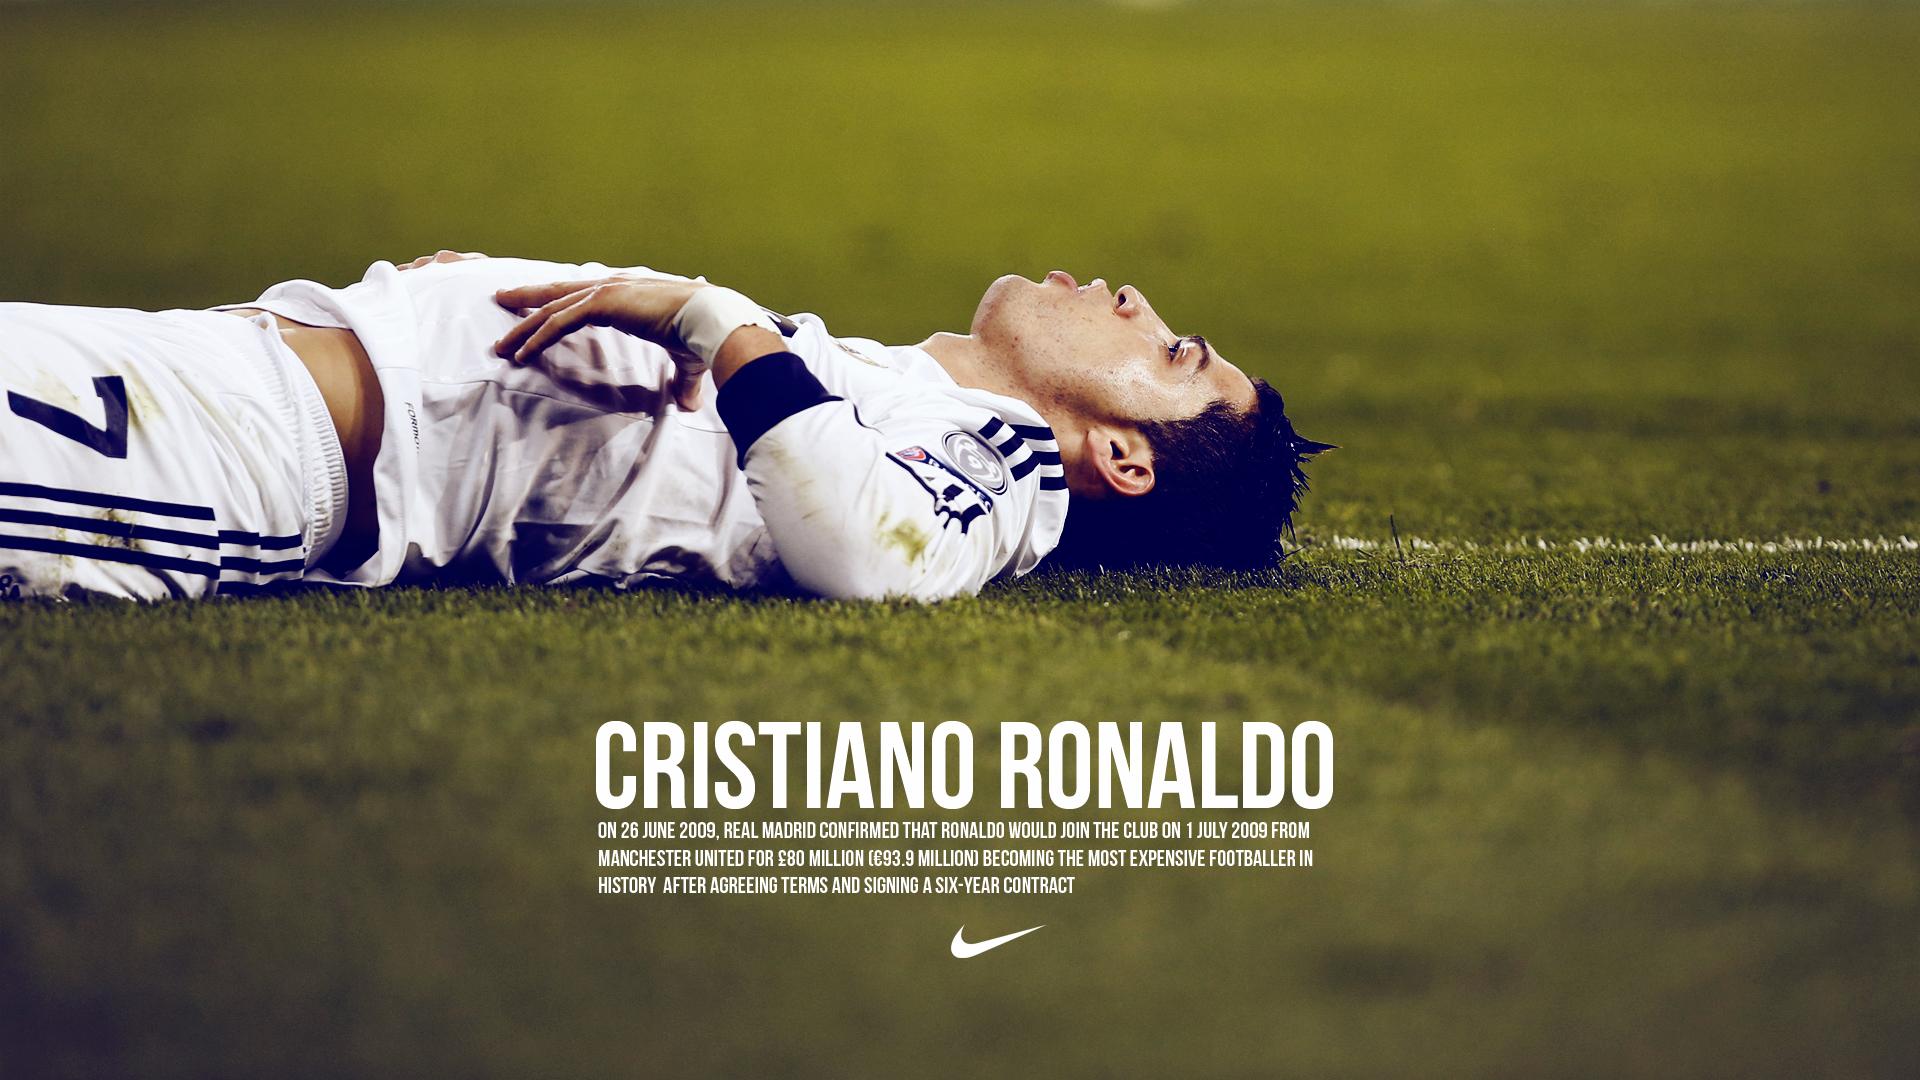 Shraddha Kapoor Full Hd Wallpaper Cristiano Ronaldo Hd Wallpapers Popopics Com